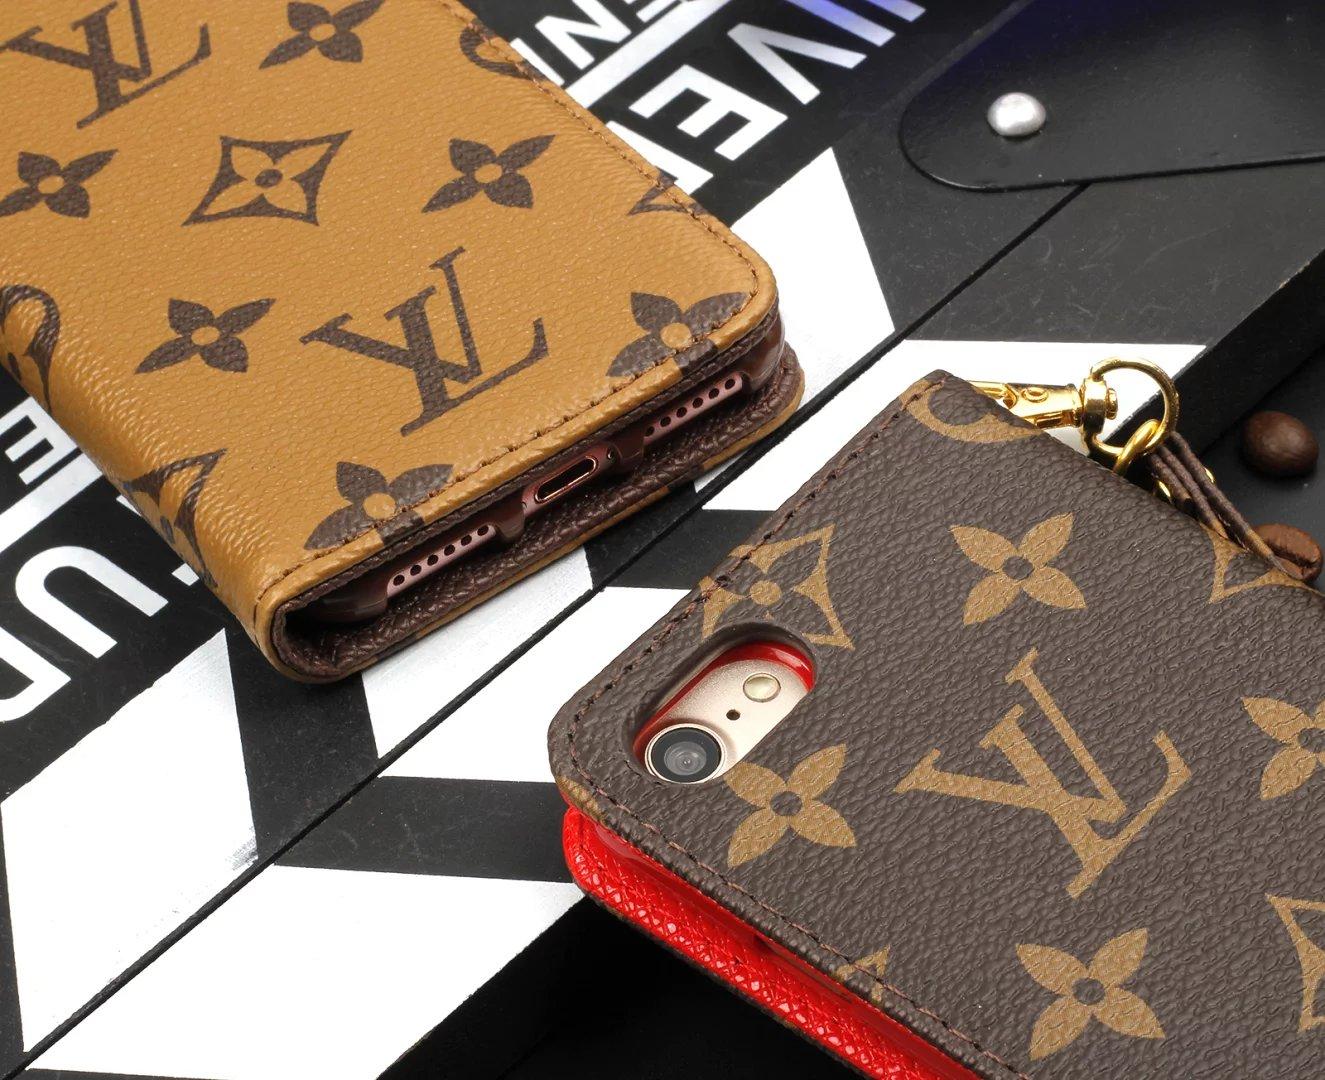 iphone case selbst gestalten iphone schutzhülle Louis Vuitton iphone6 hülle eigene hülle designen iphone 6 erscheinung iphone 6 hülle 6lbst gestalten design handyhülle iphone 6 billig ipad tasche leder